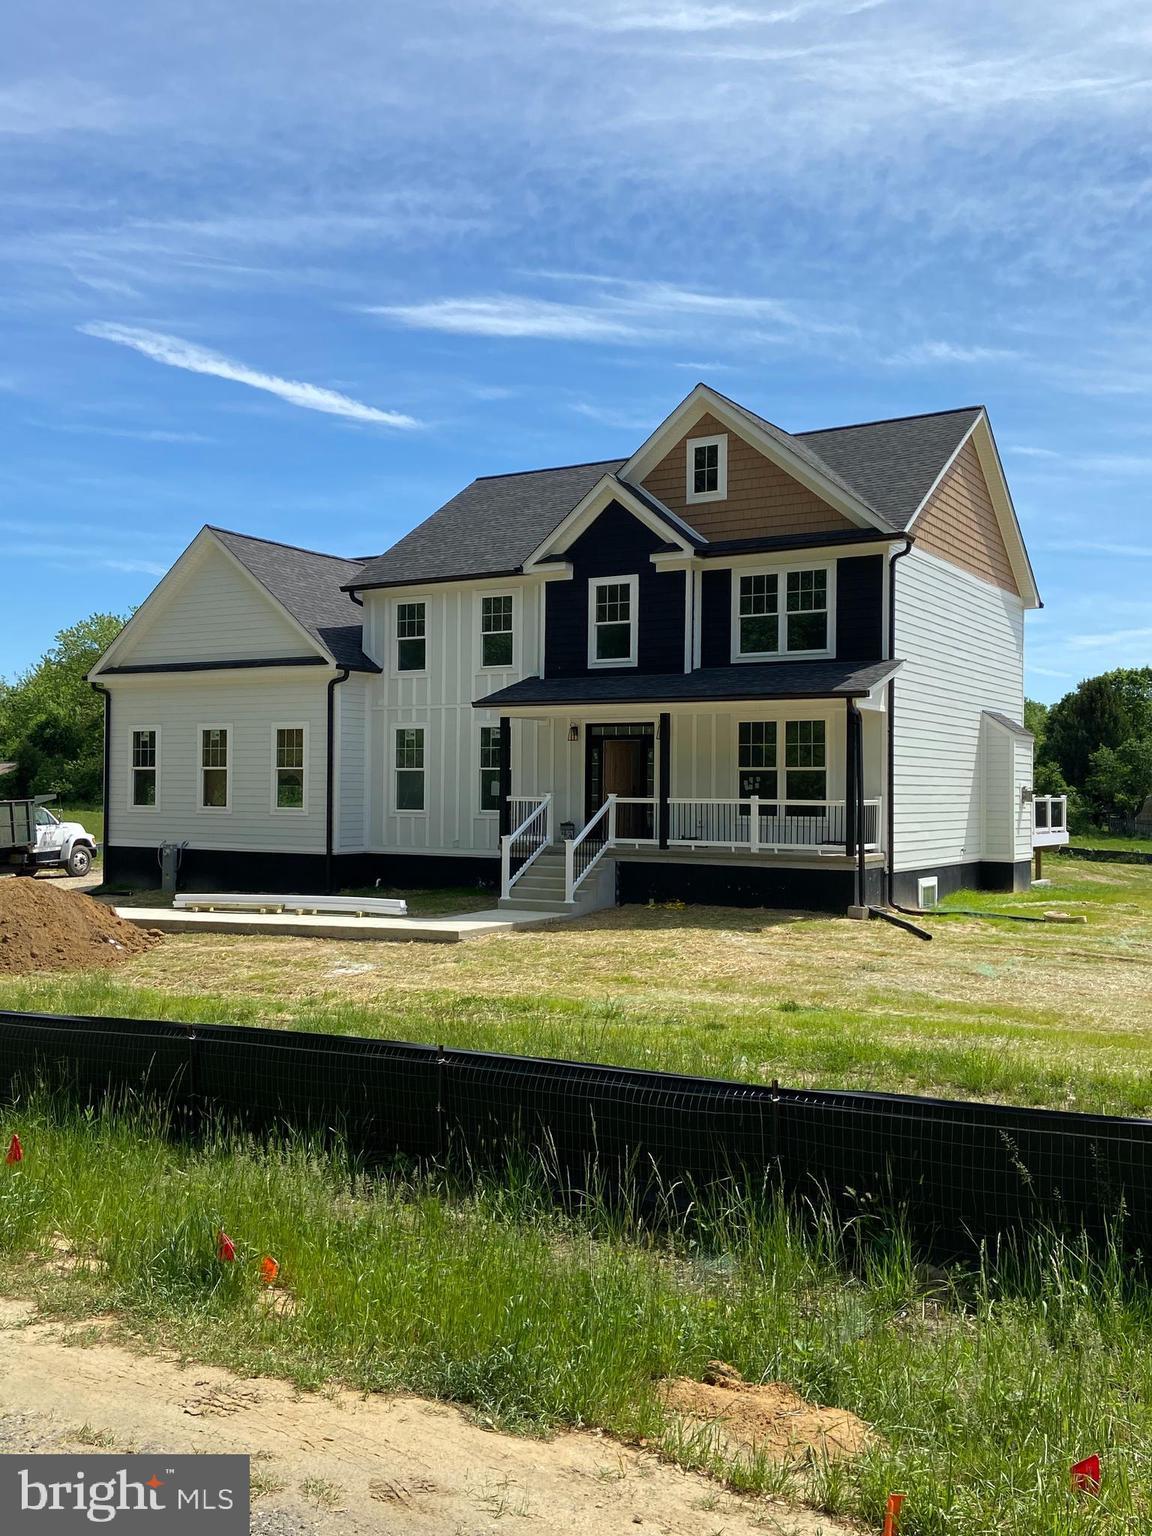 2529 DAVIDSONVILLE ROAD, GAMBRILLS, Maryland 21054, 5 Bedrooms Bedrooms, ,5 BathroomsBathrooms,Single Family,For Sale,2529 DAVIDSONVILLE ROAD,MDAA458276